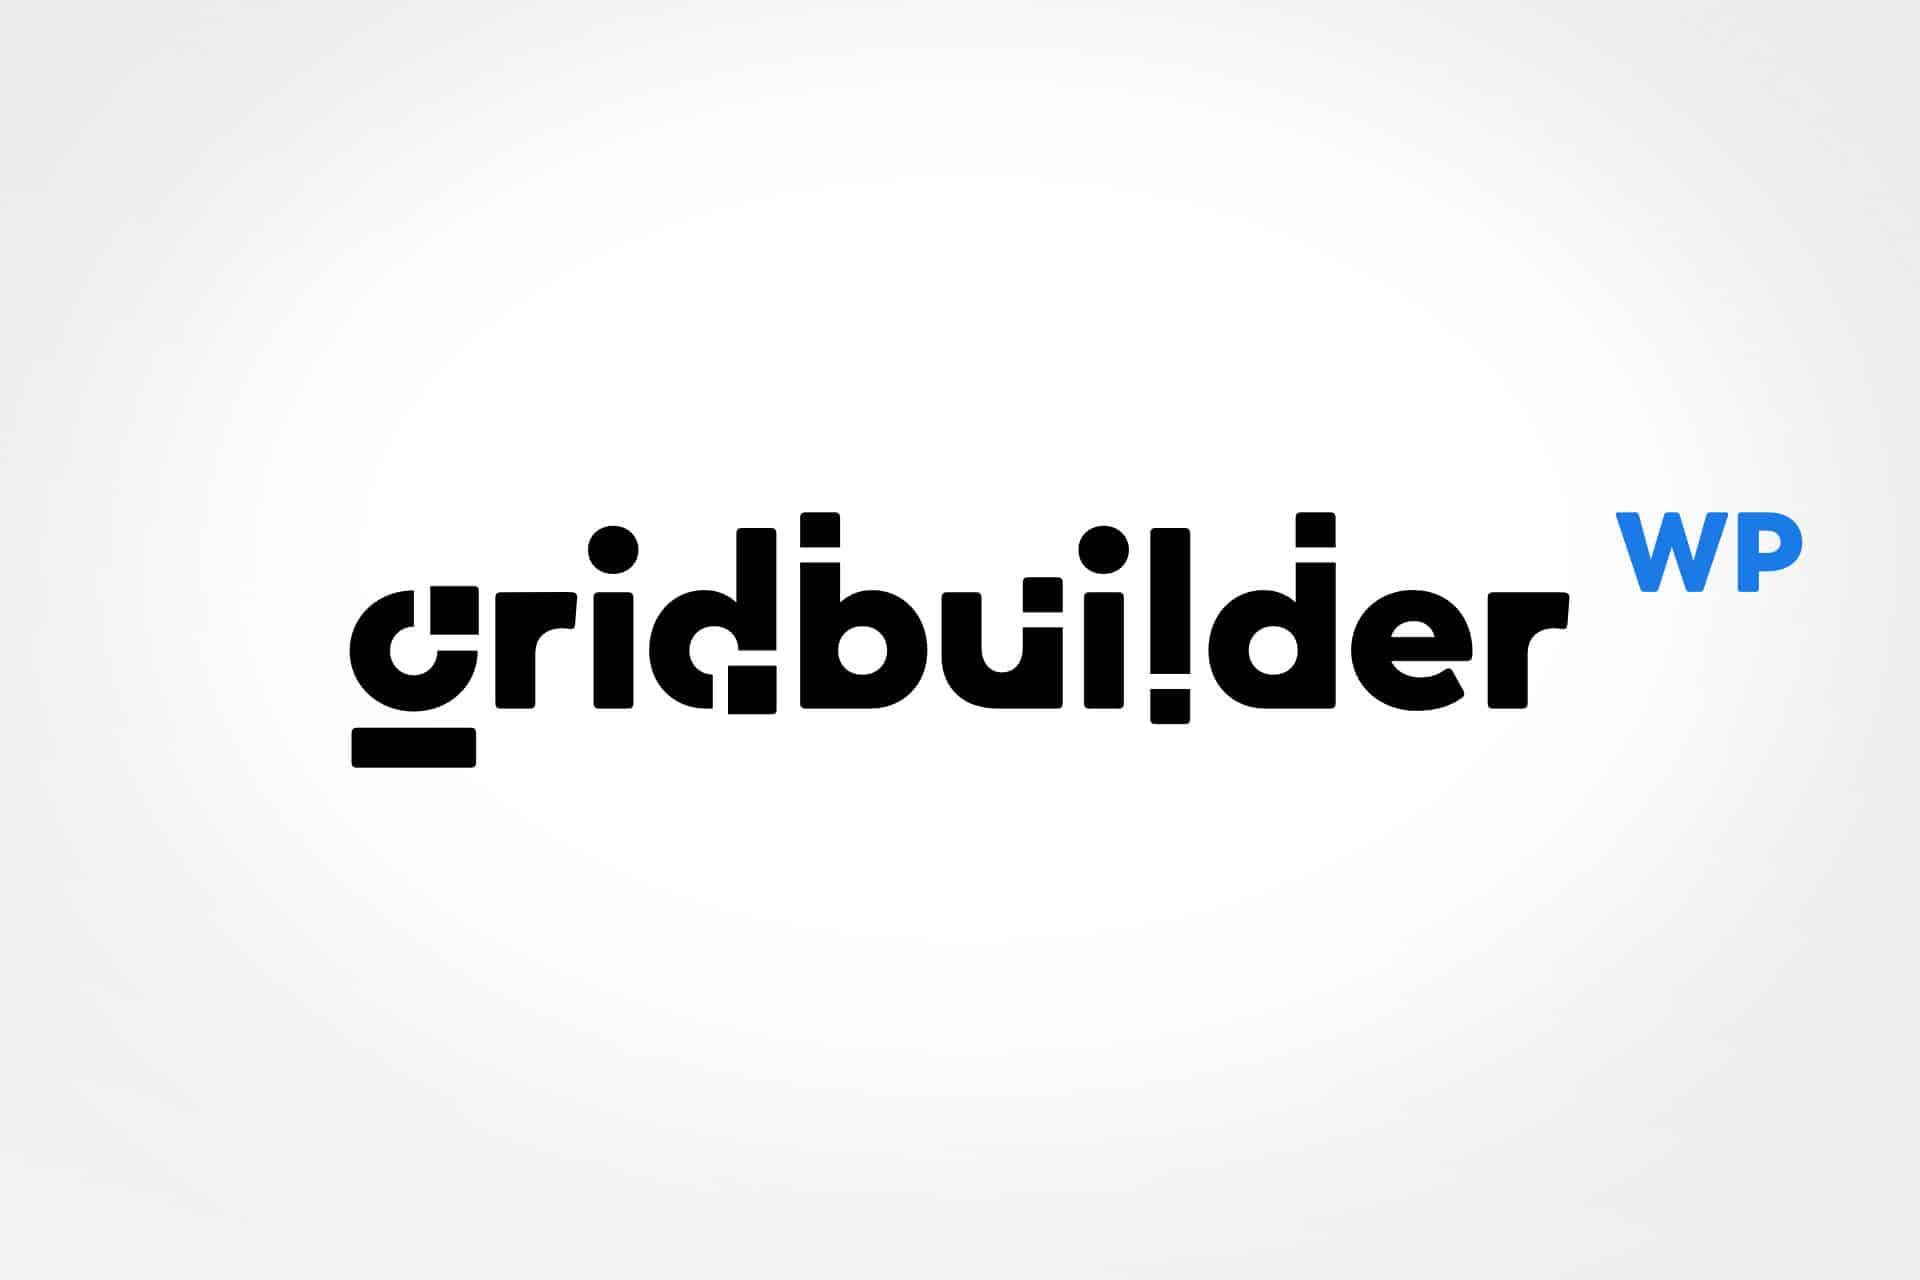 logo wpgridbuilder